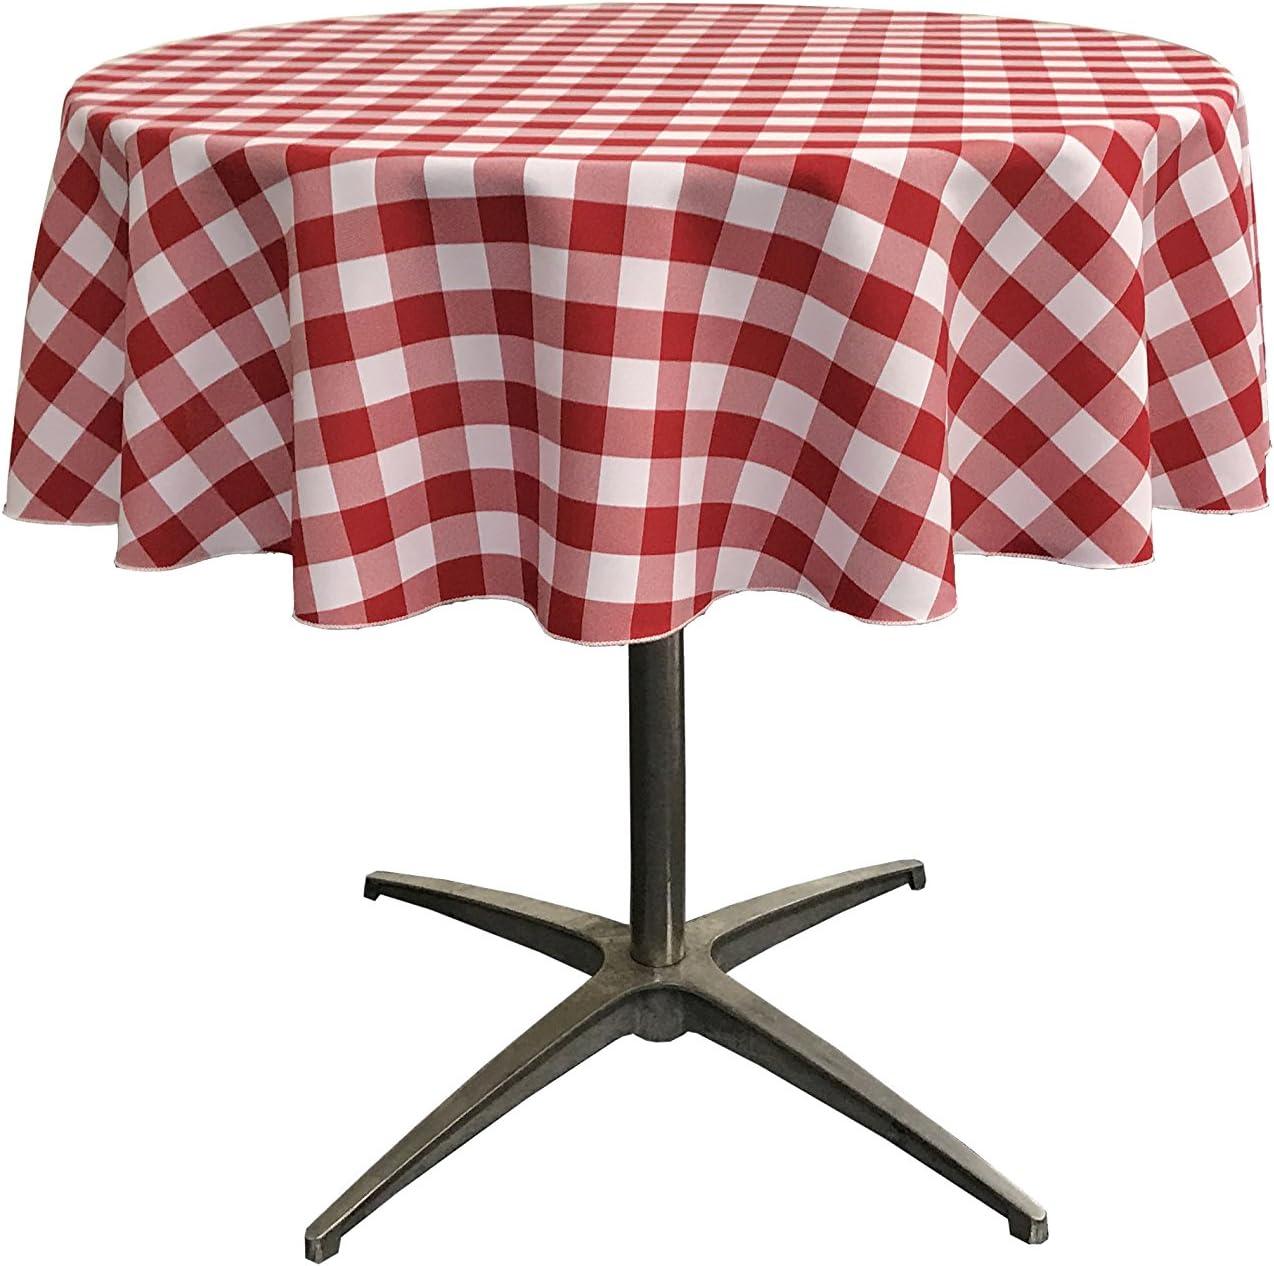 La Linen Poly Checkered Round Tablecloth 51 Inch Orange White 129 5 X 129 5 X 0 04 Cm Amazon Co Uk Kitchen Home